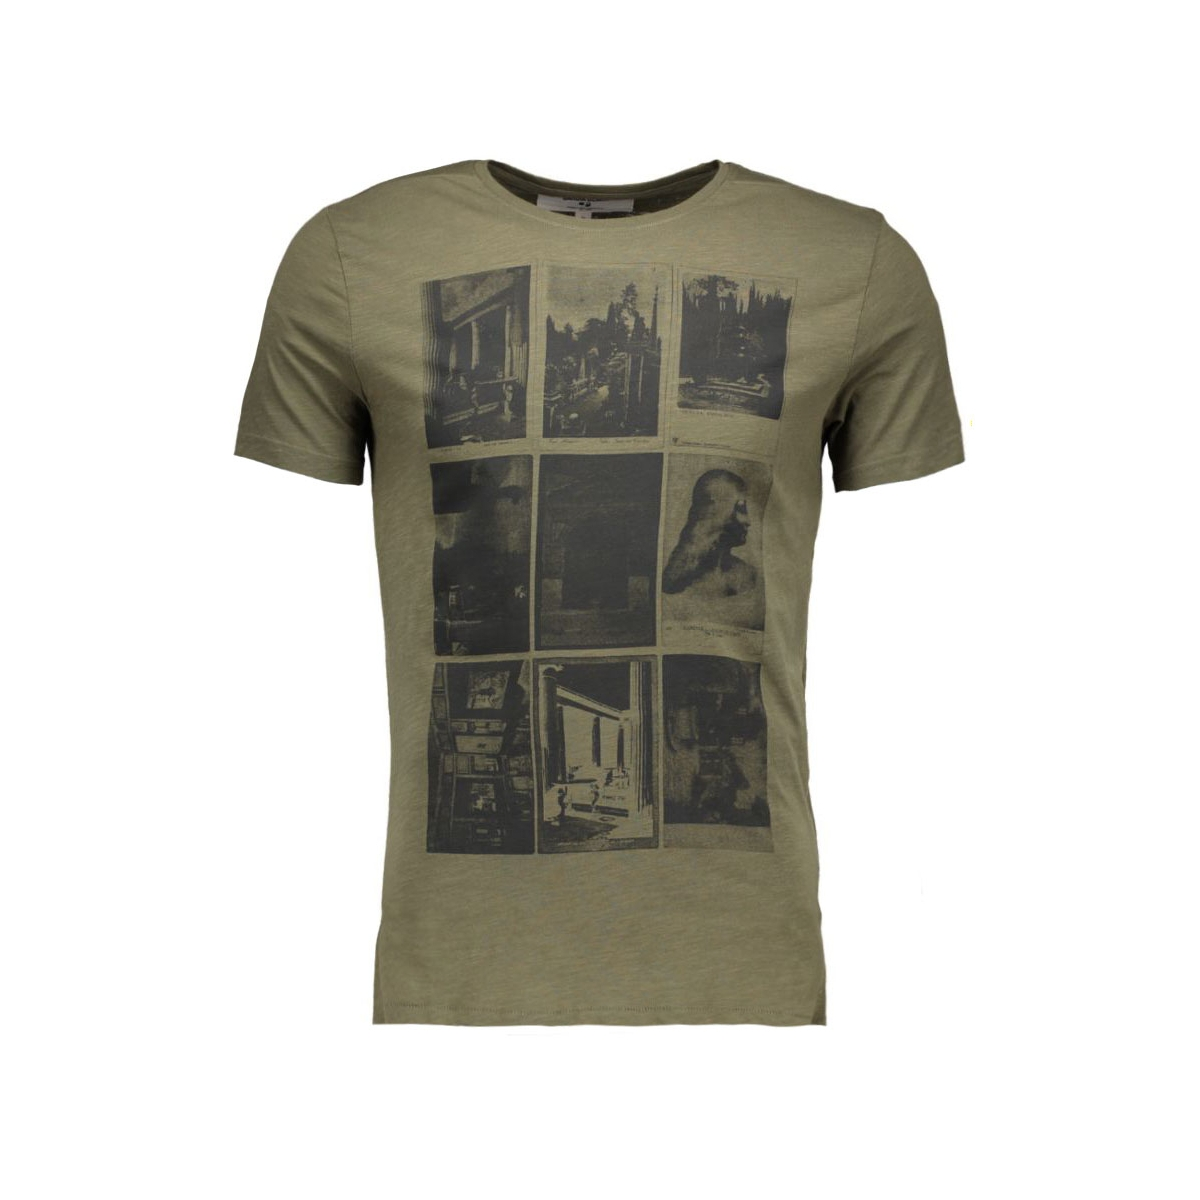 t61202 garcia t-shirt 1970 base army